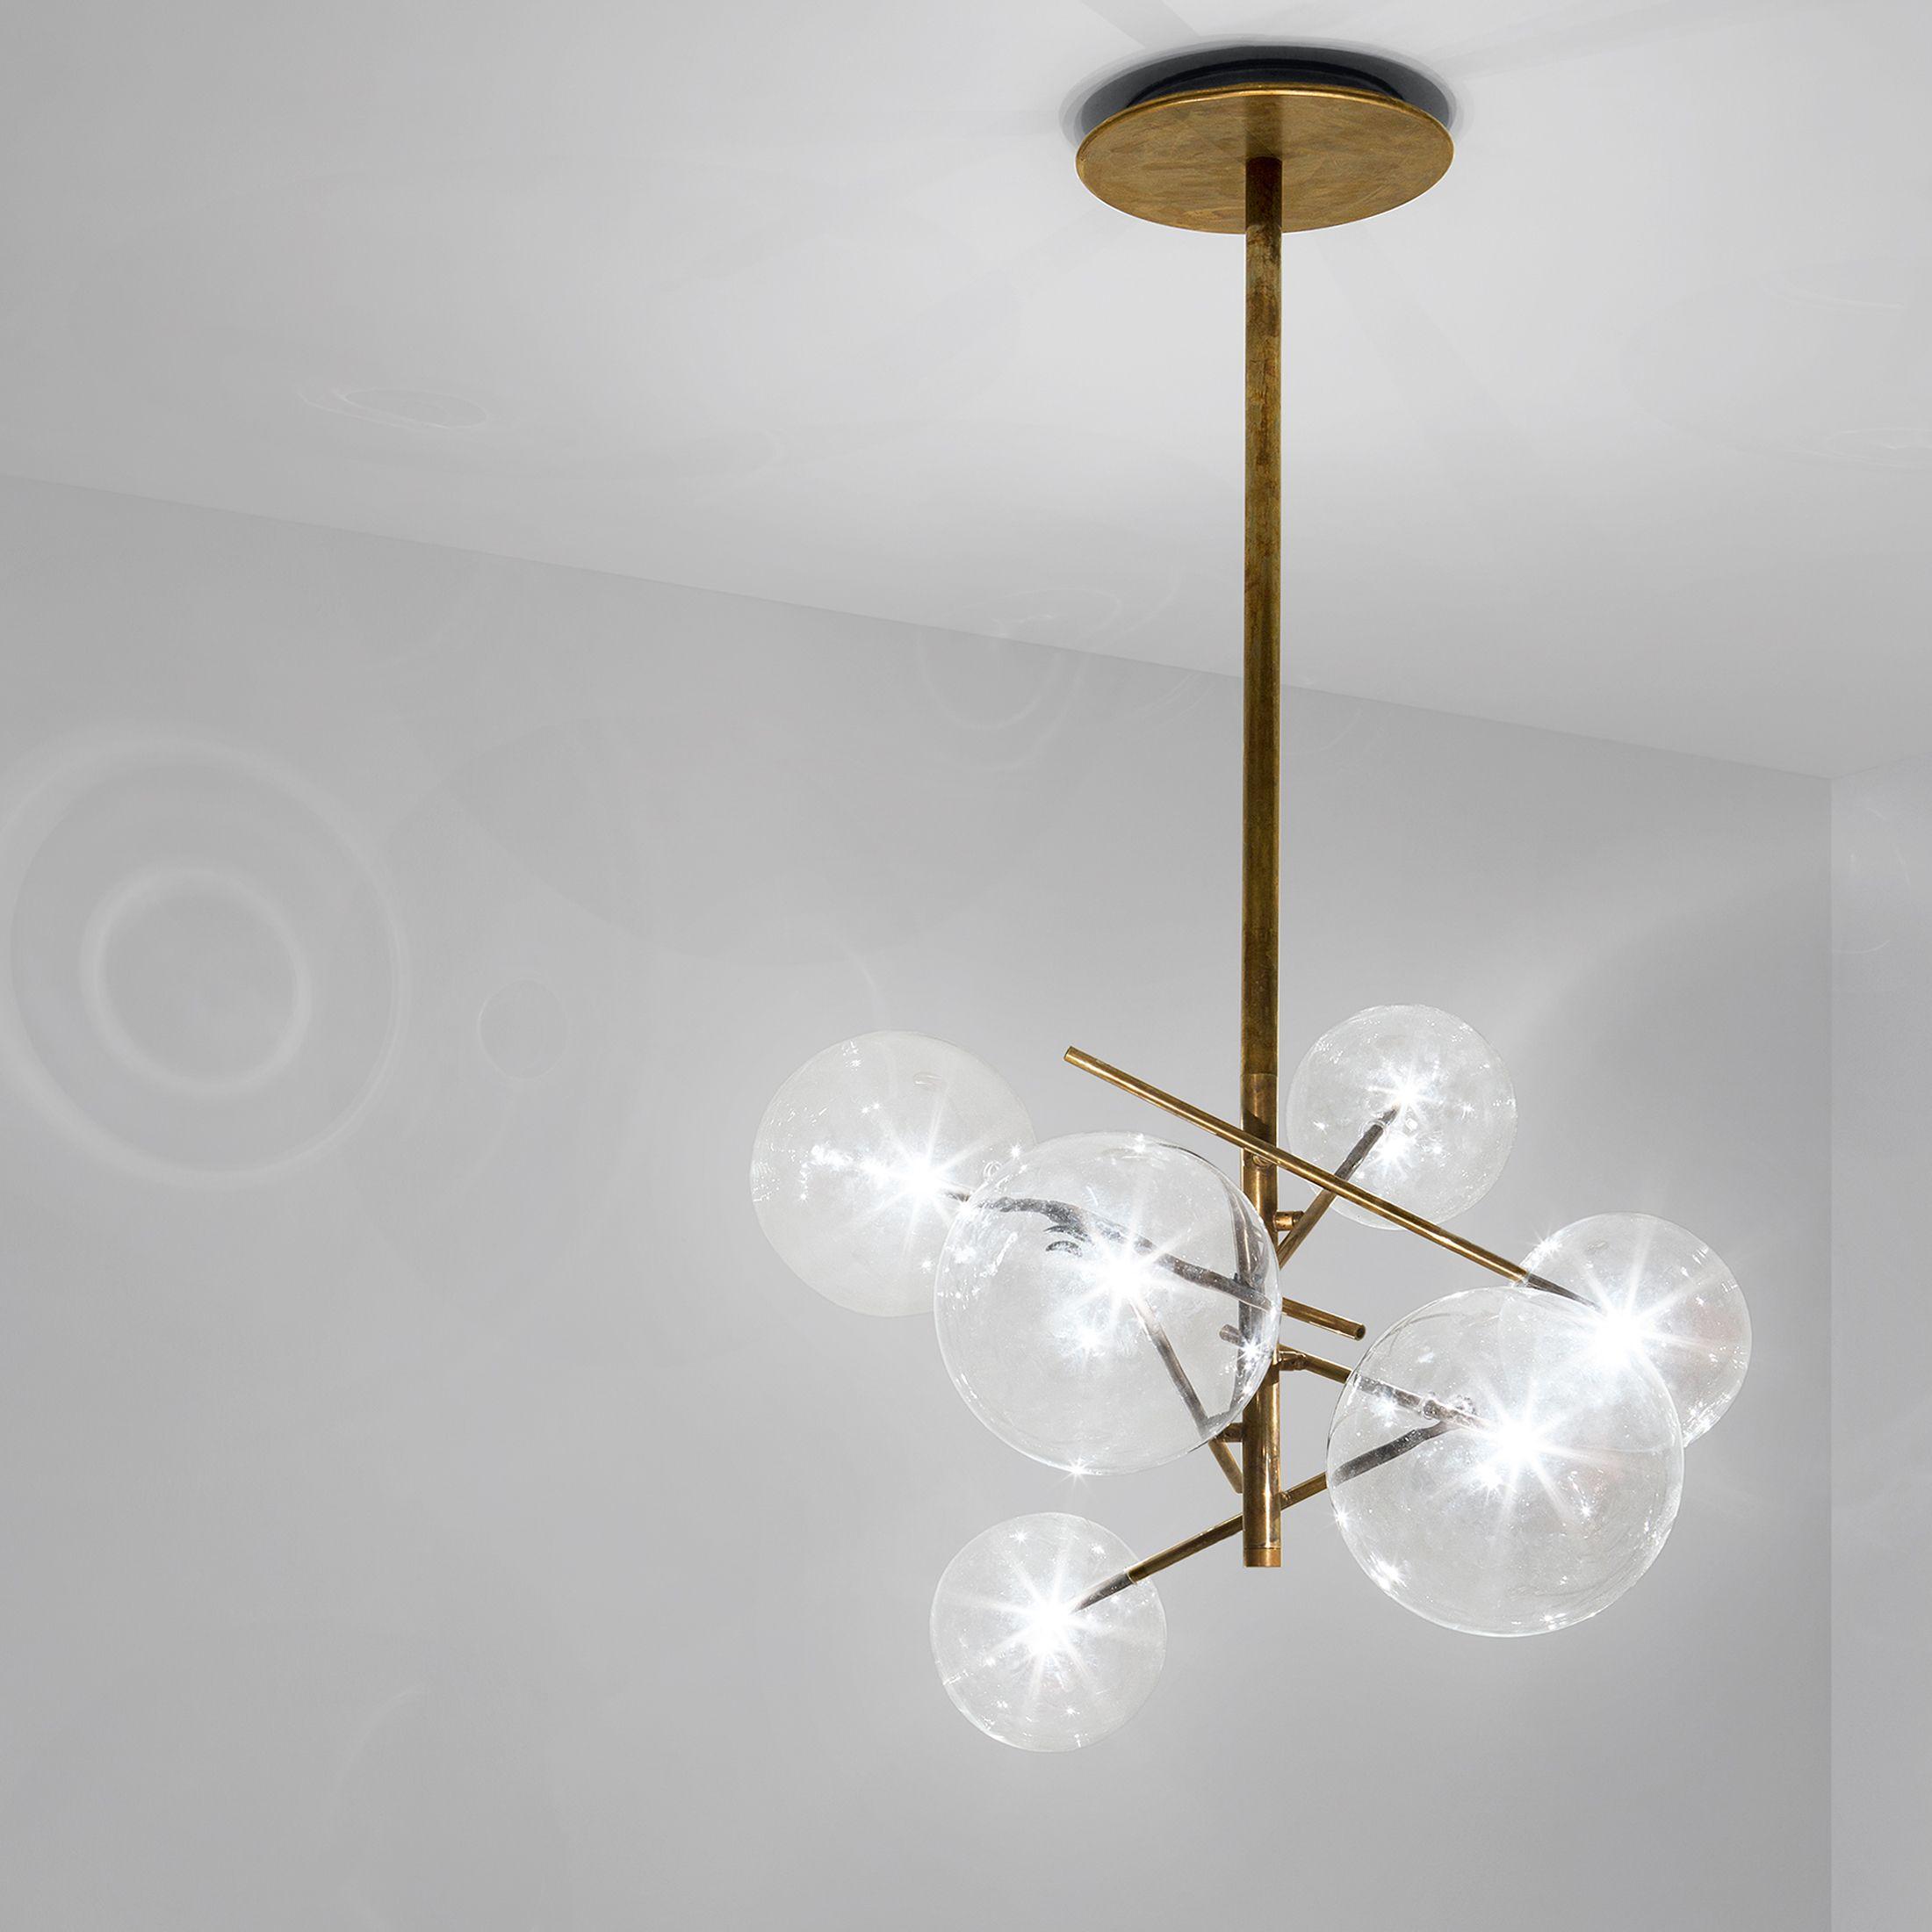 Hanging lamp with halogen point light (120 Watt). 6 transparent ...